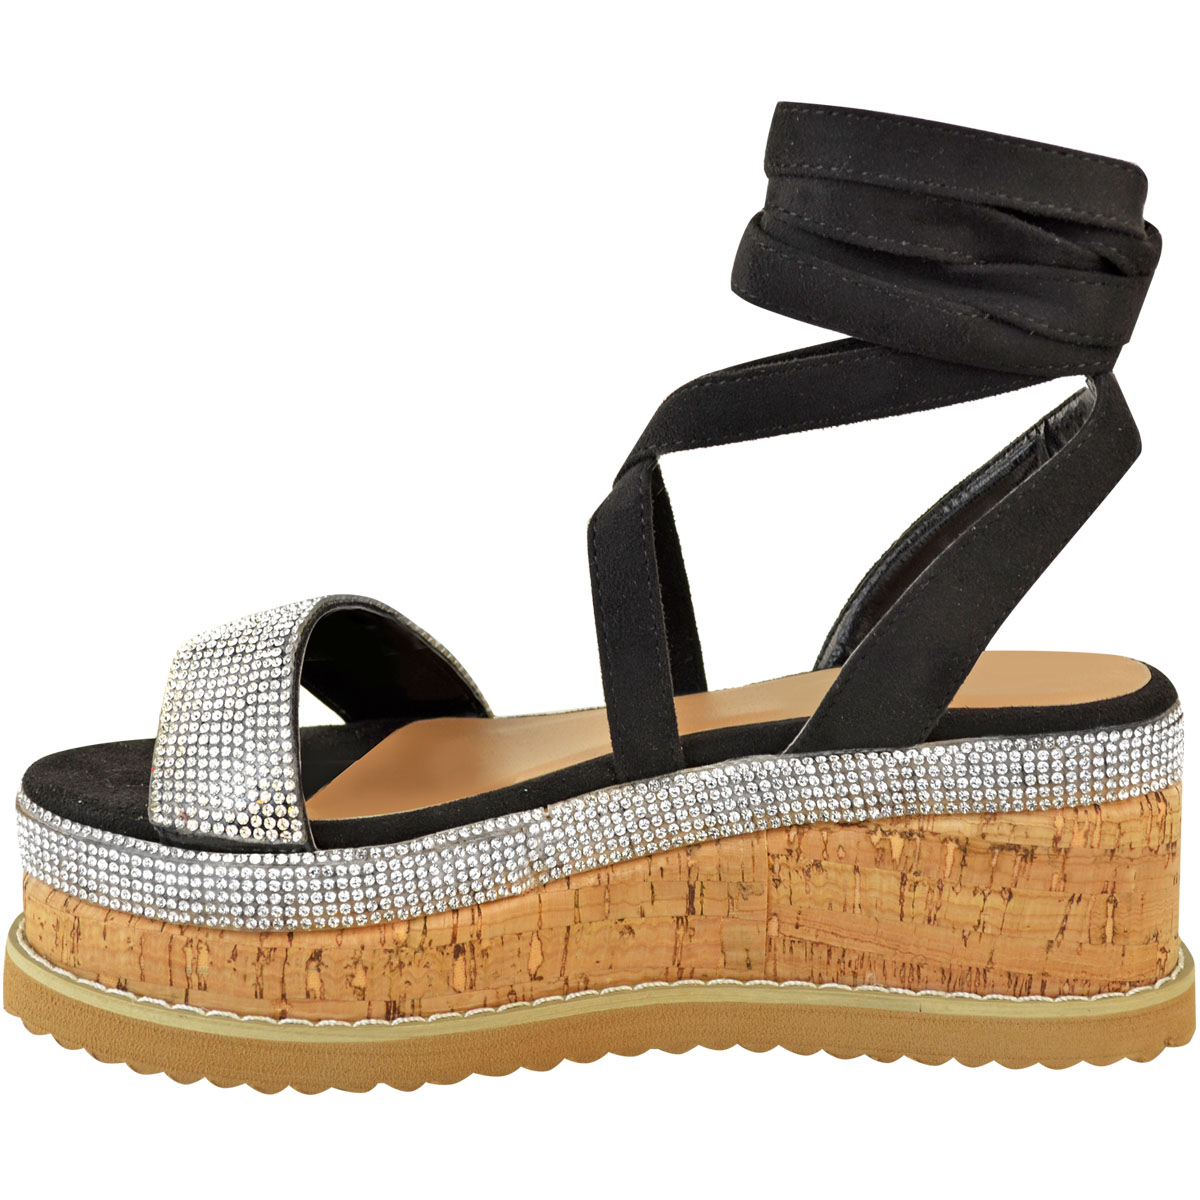 Womens-Ladies-Flatform-Diamante-Wedge-Sandals-Platform-Ankle-Lace-Up-Summer-Size thumbnail 5